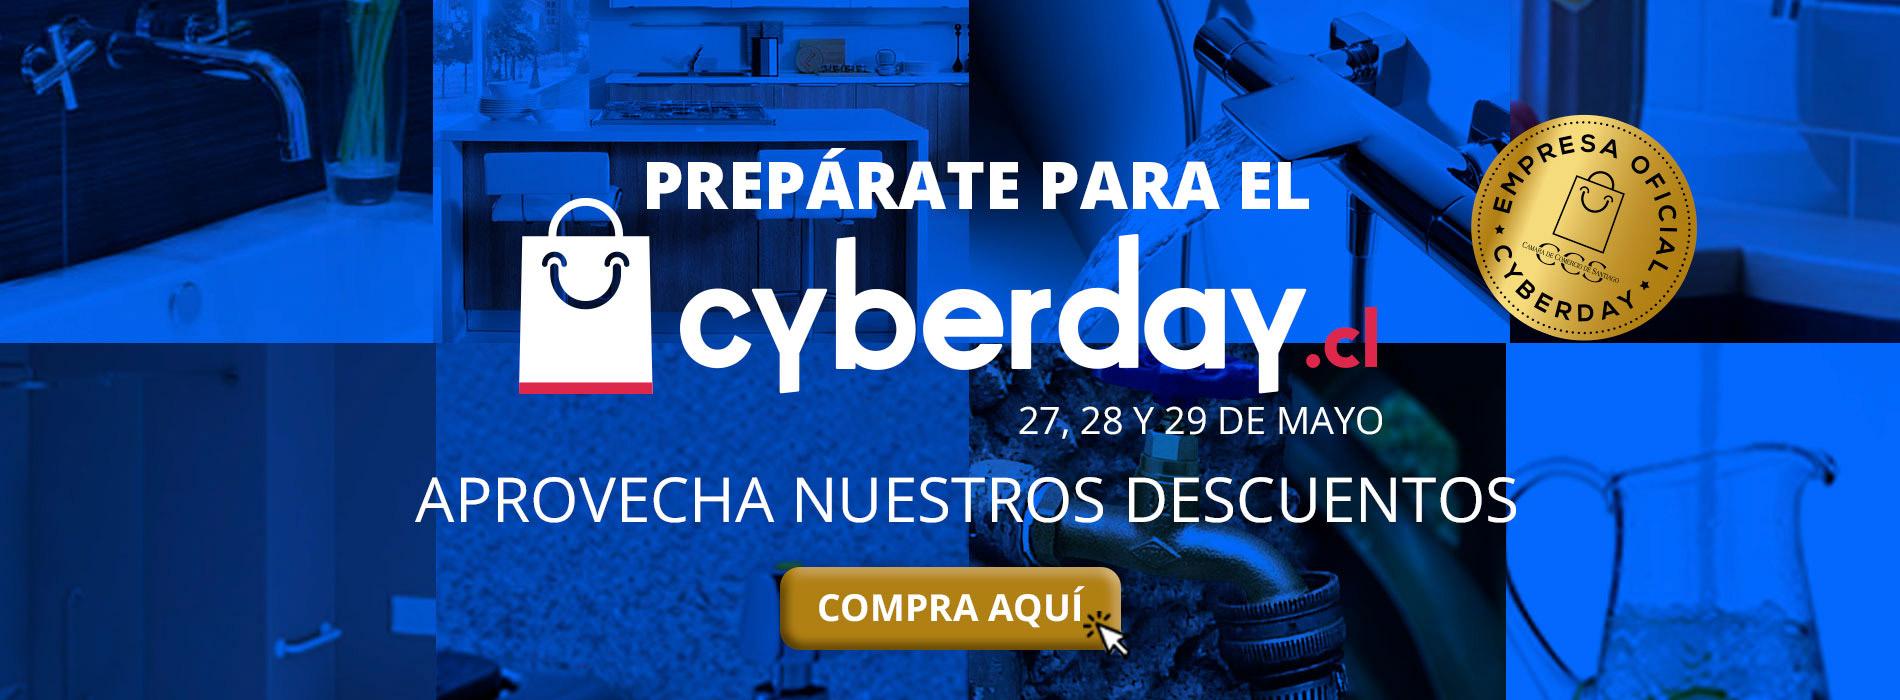 Prepárate Cyber Nibsa [ACTIVO]